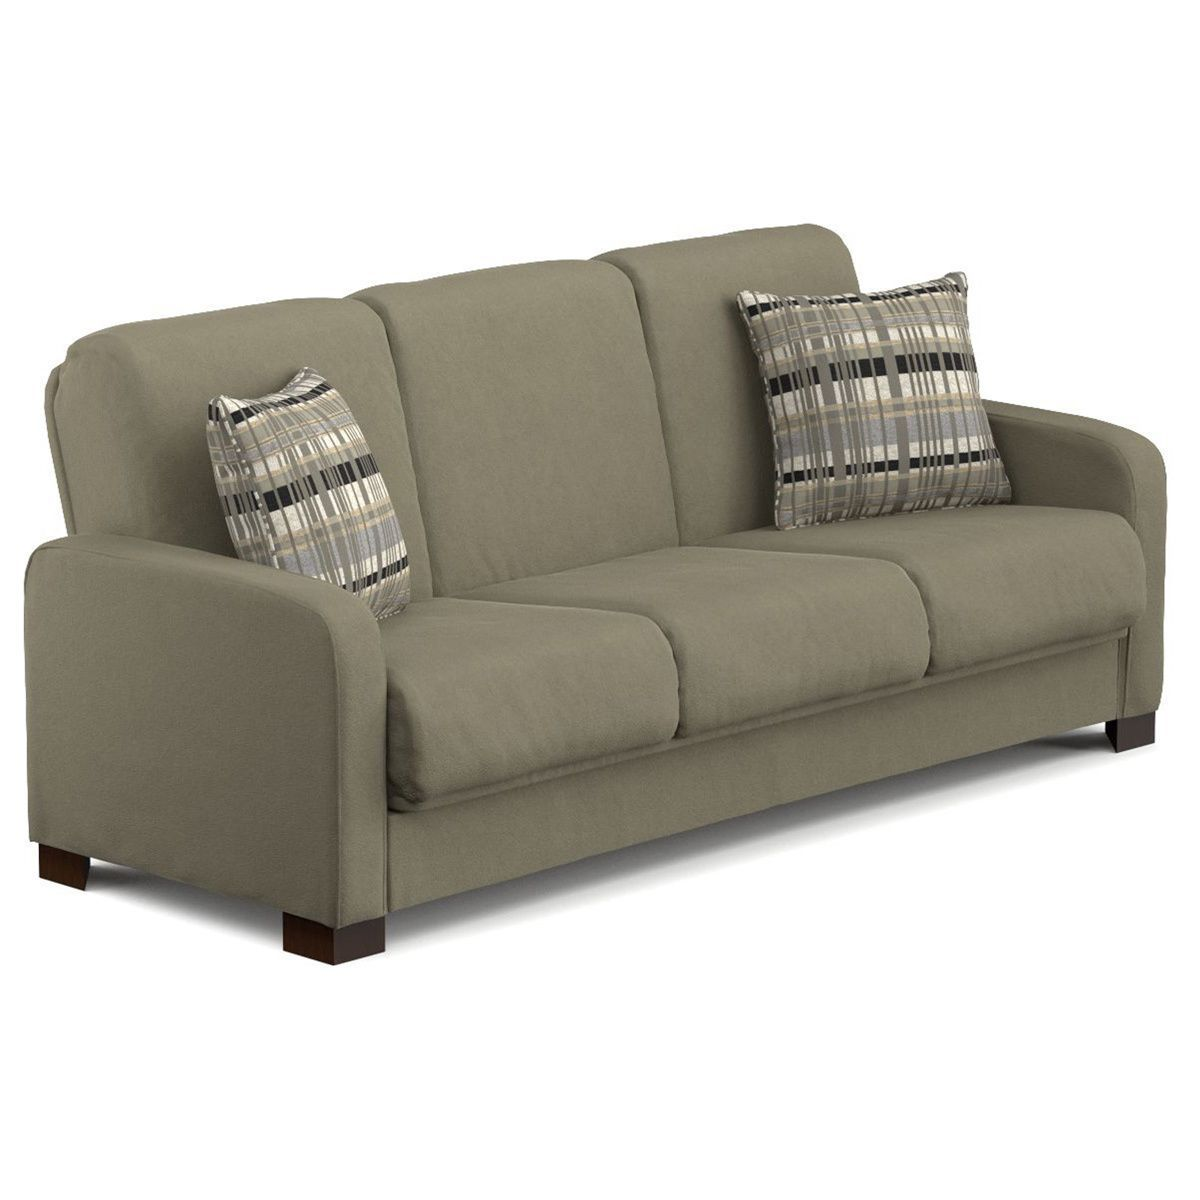 portfolio trace convert a couch sage grey microfiber futon sofa rh pinterest co uk